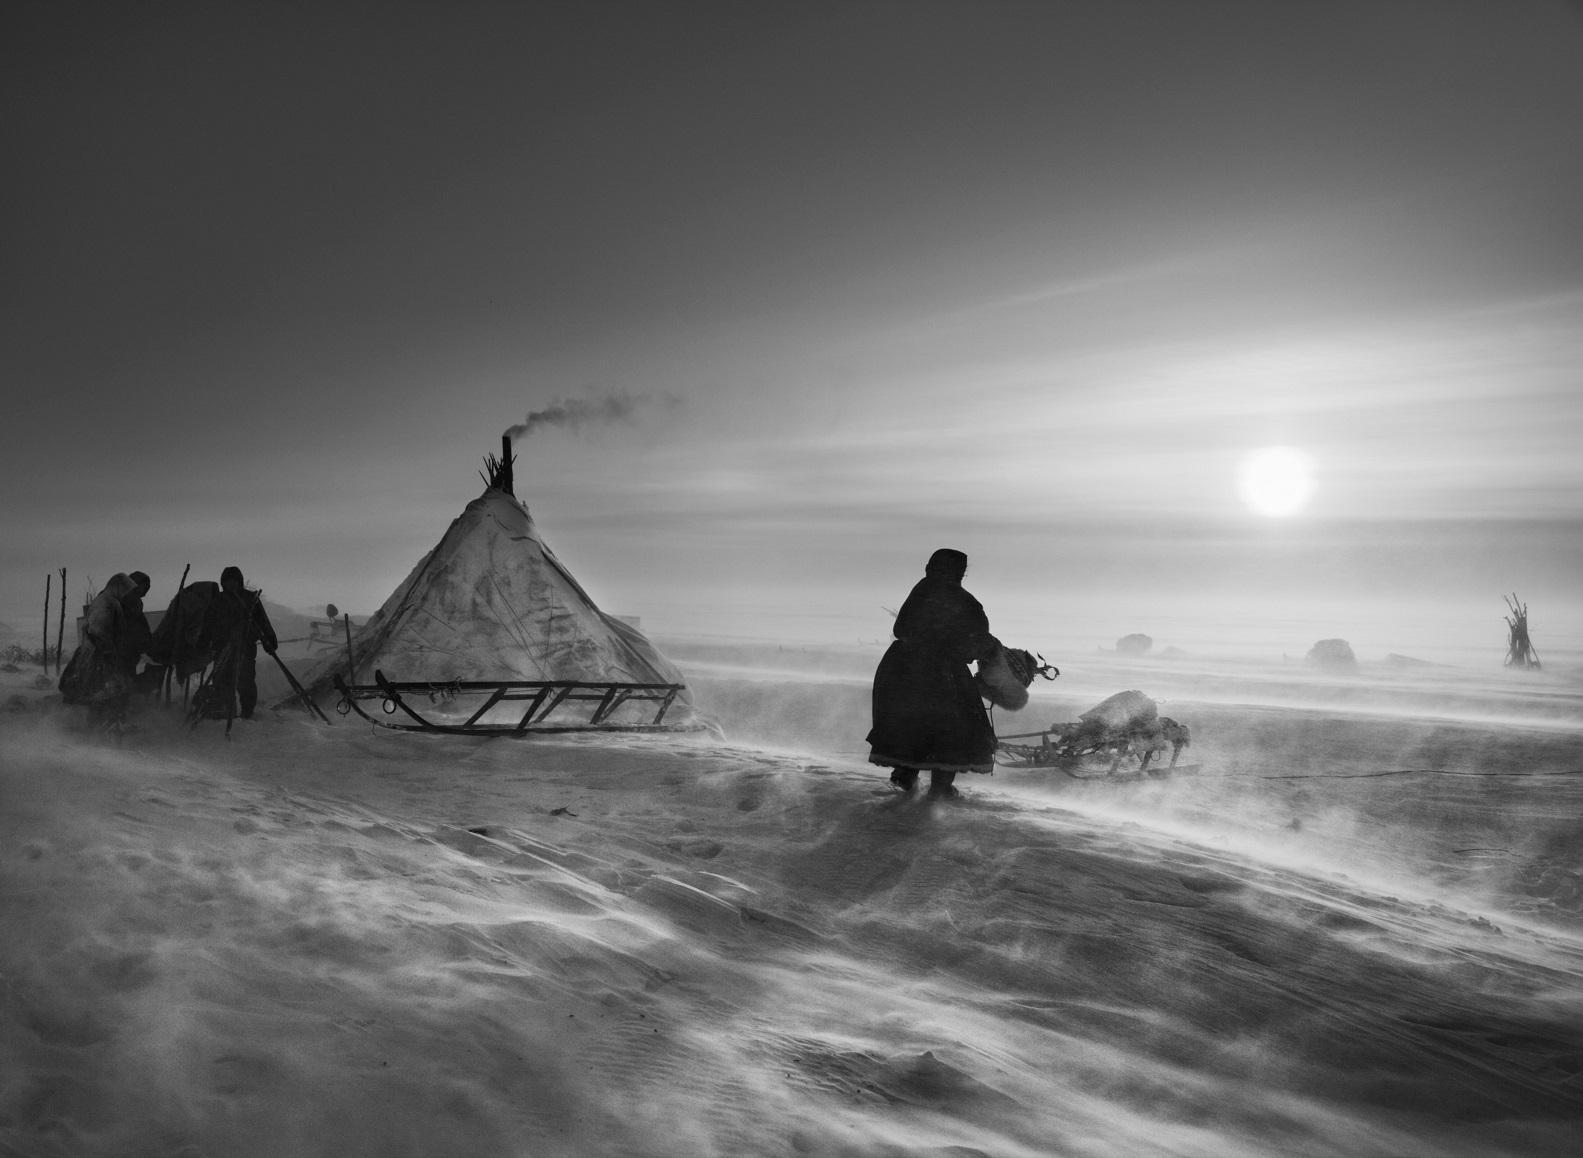 Penisola di Yamal, Siberia, 2011 ©Sebastião Salgado/Amazonas Images